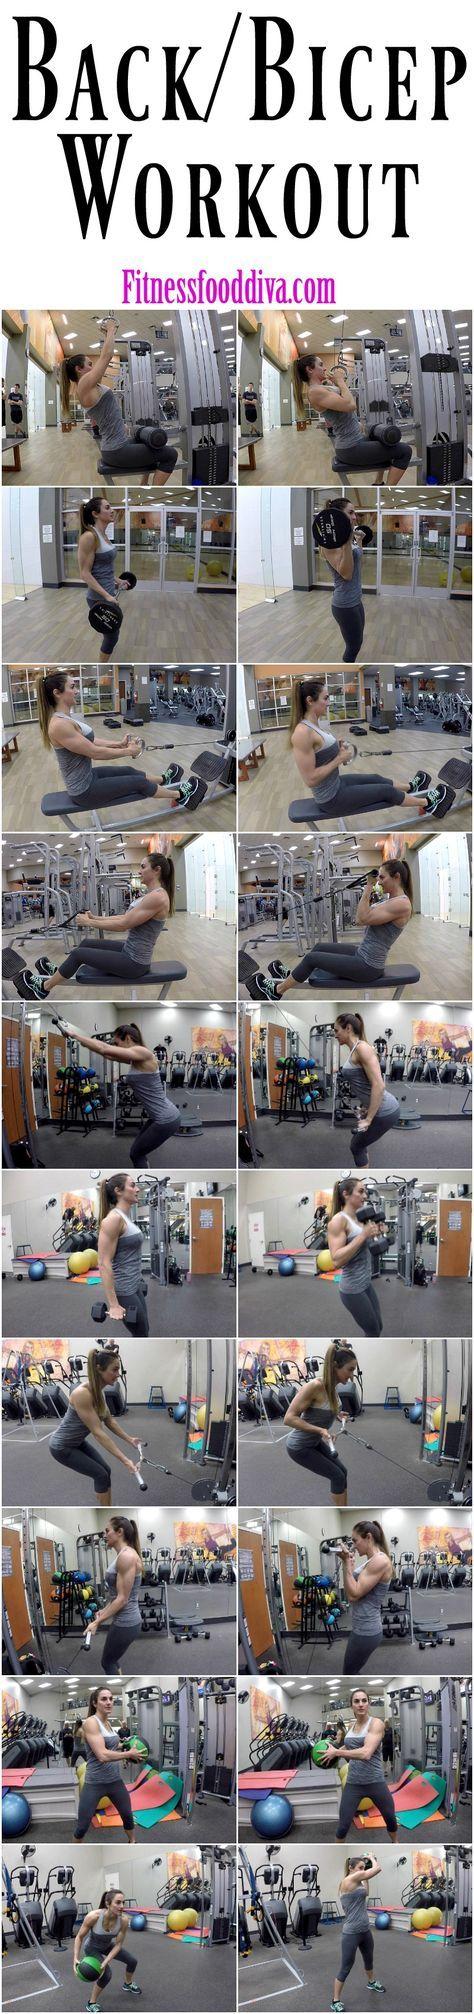 Free Back/Bicep Workout | Fitness Food Diva